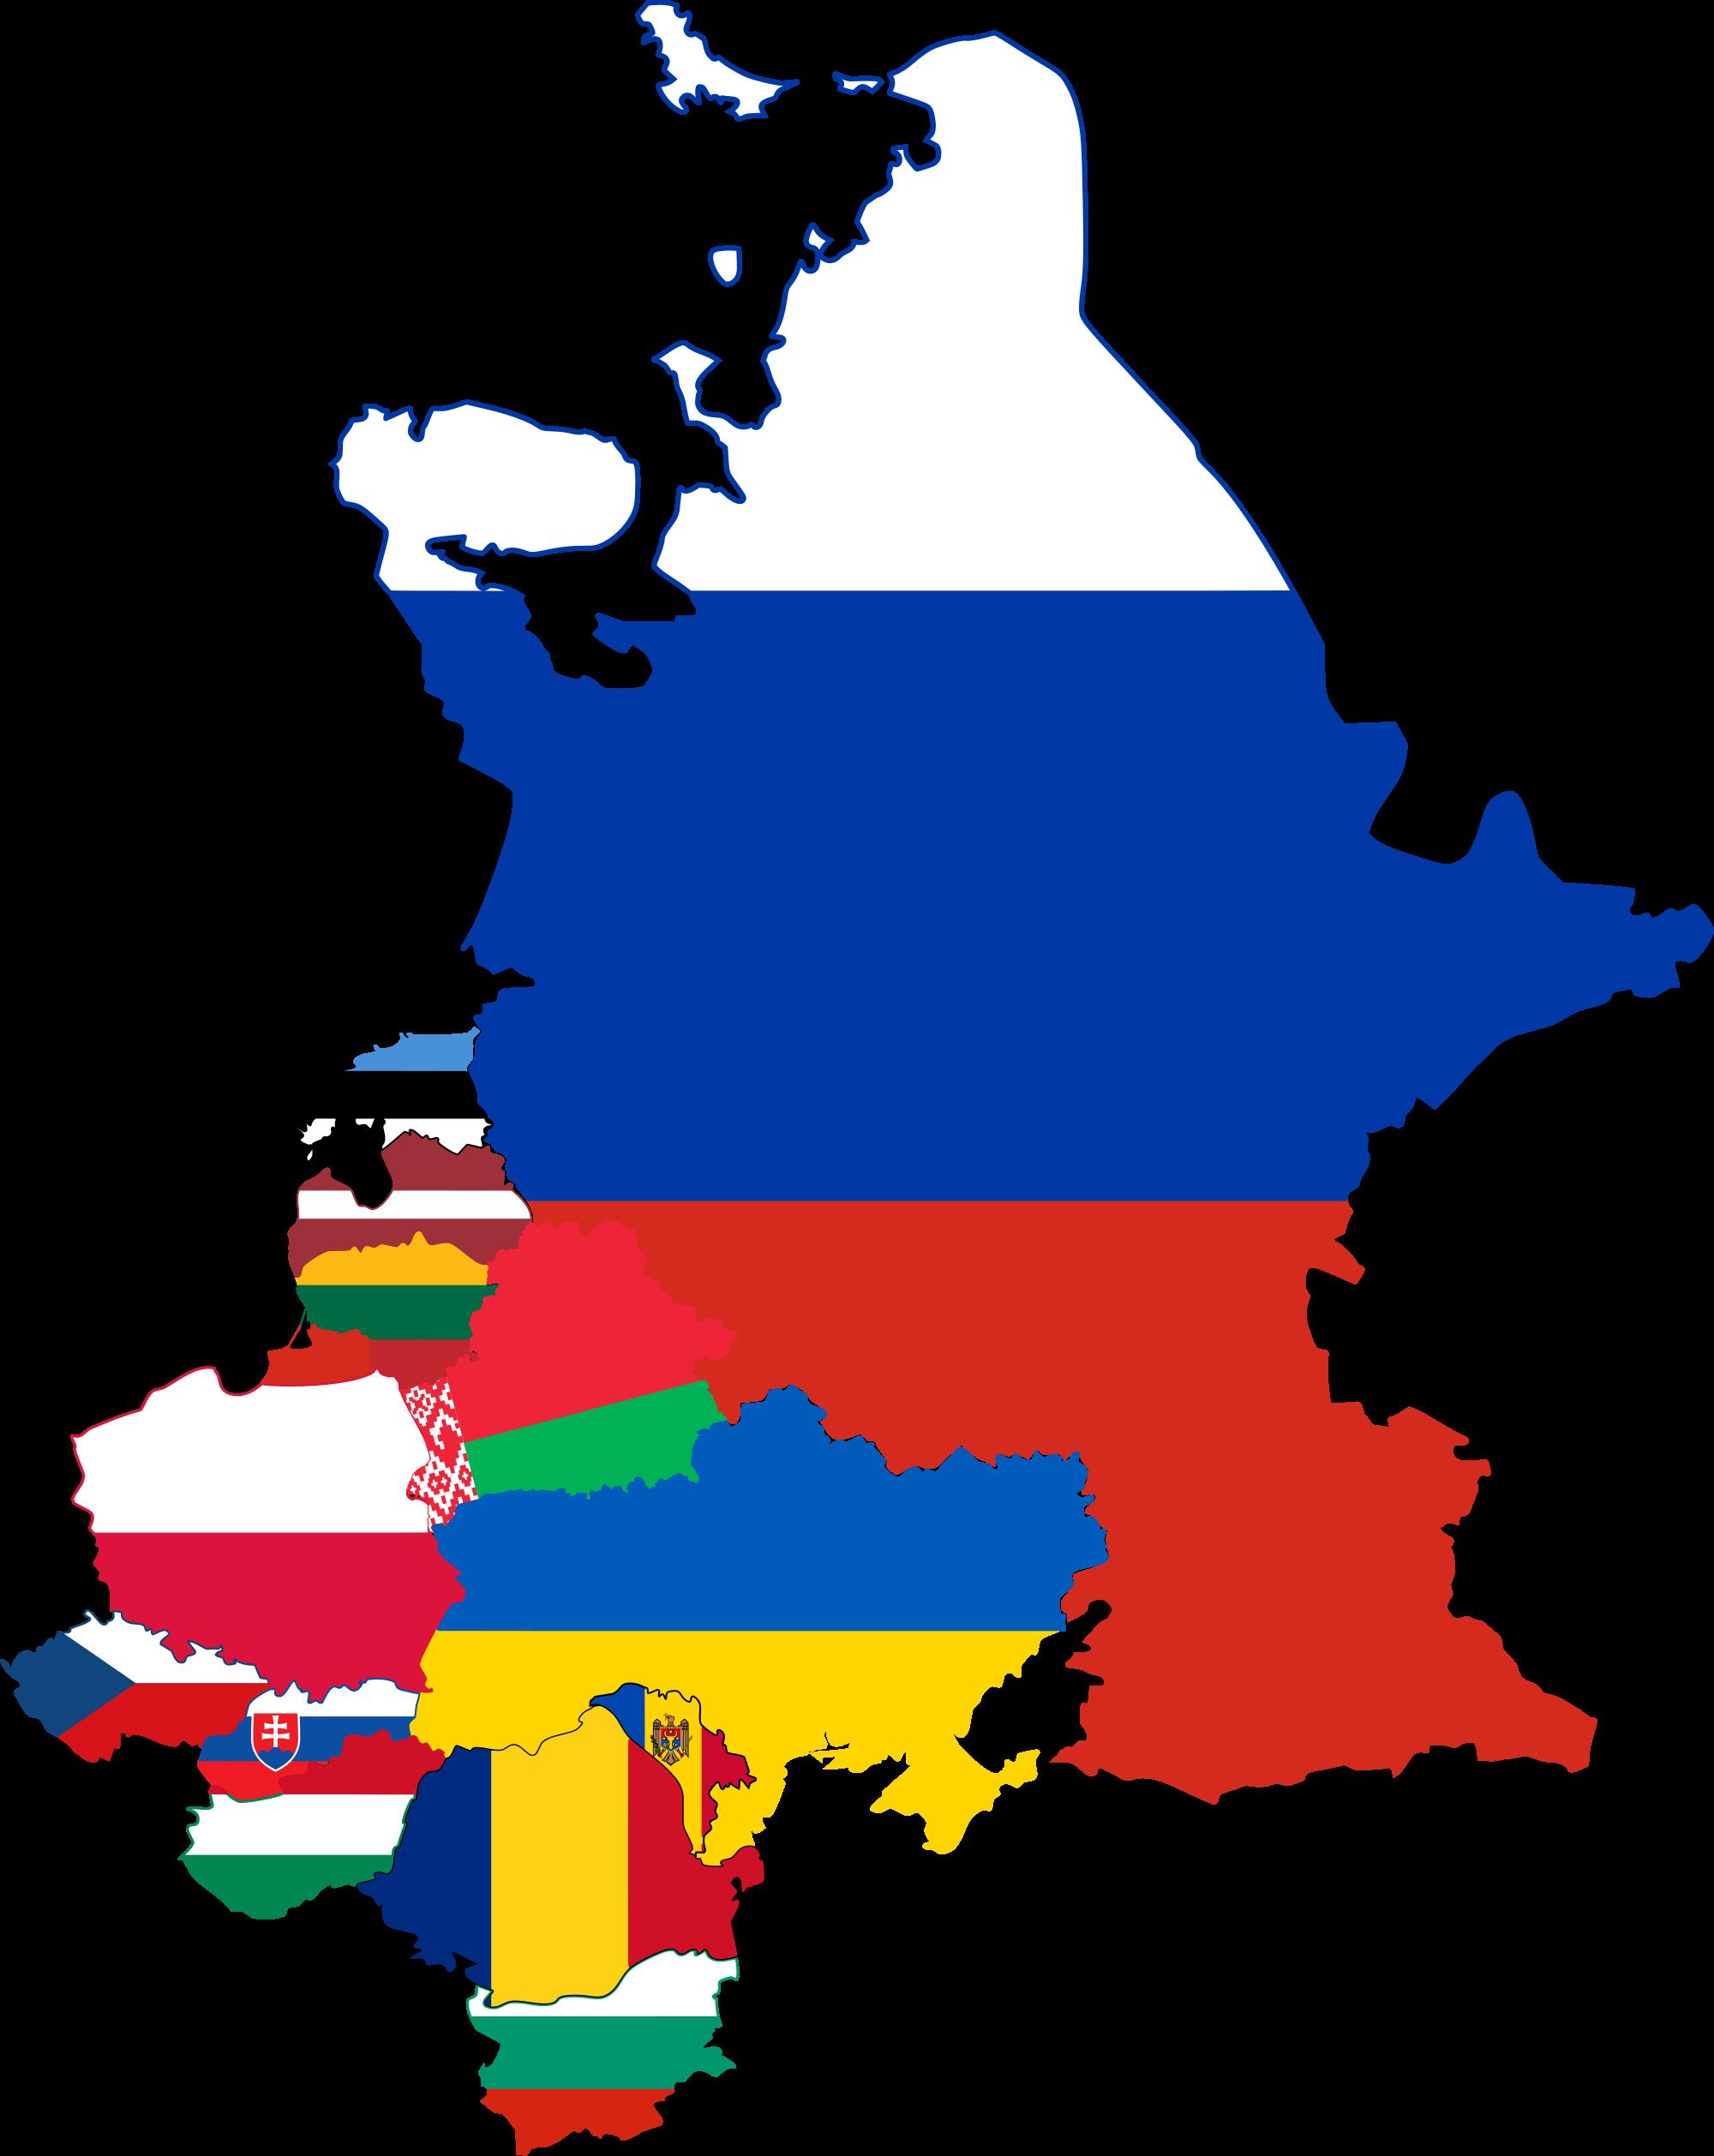 Map at getdrawings com. Europe clipart history european